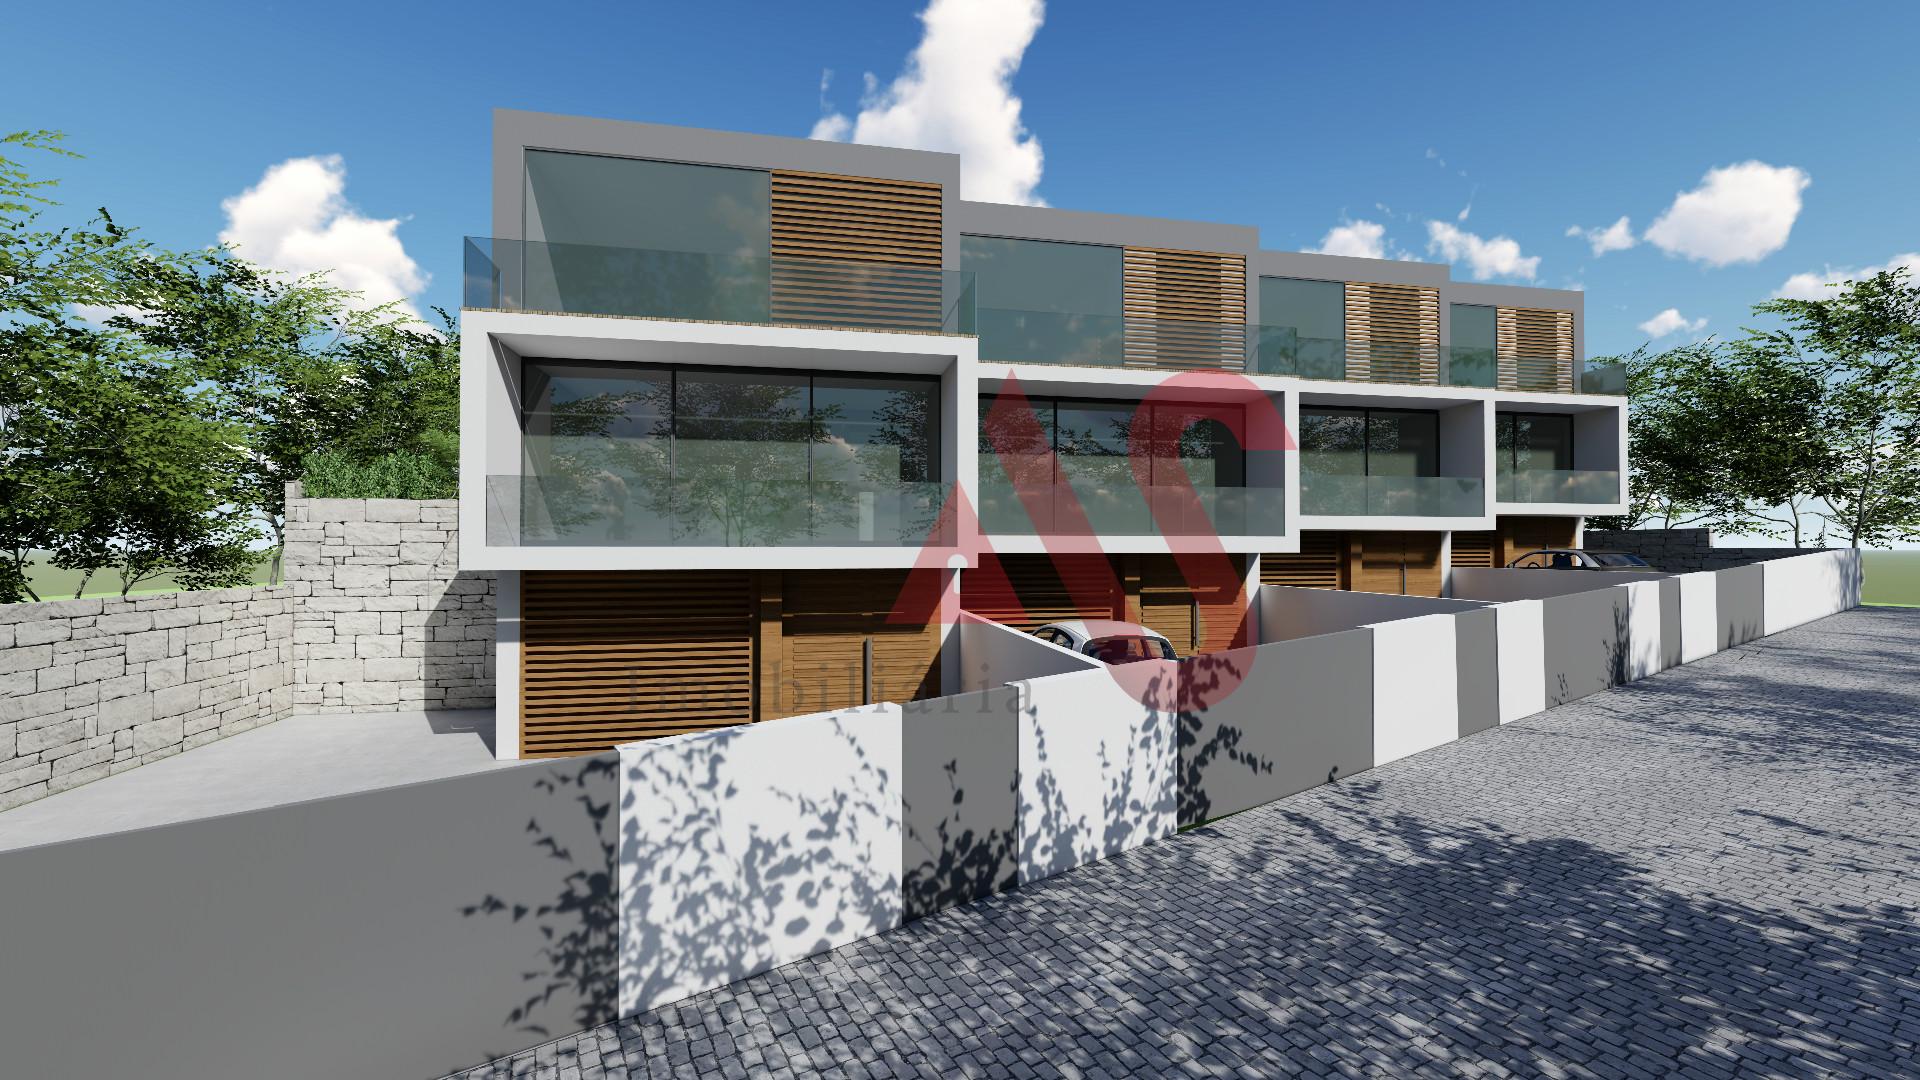 Moradia nova T3 em S. Torcato, Guimarães